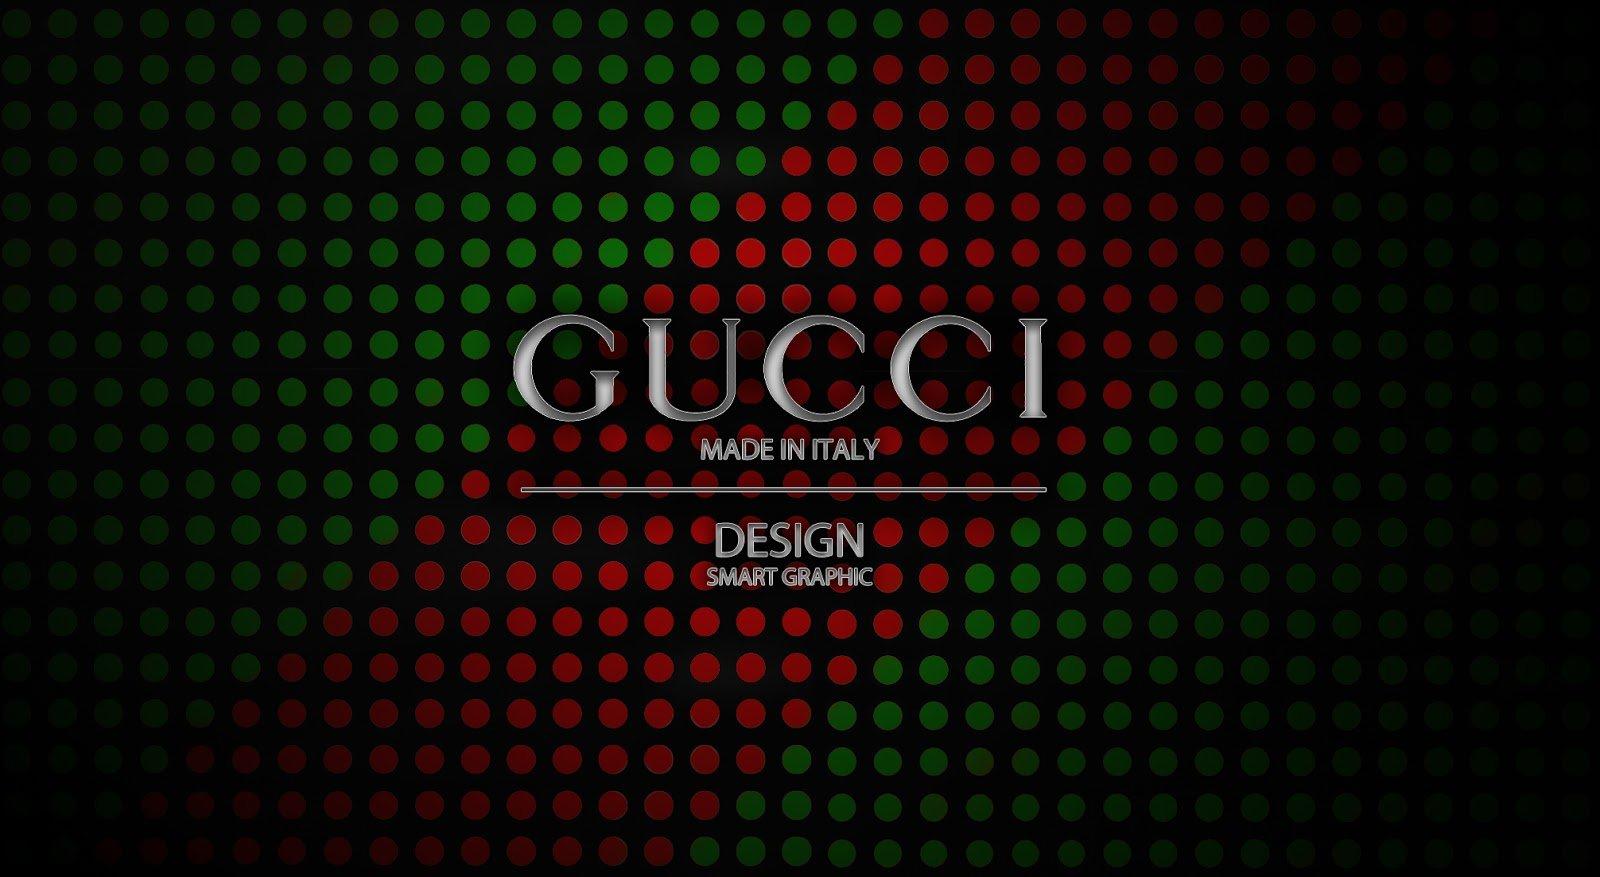 Gucci wallpaper hd wallpapersafari - Louis vuitton screensaver ...